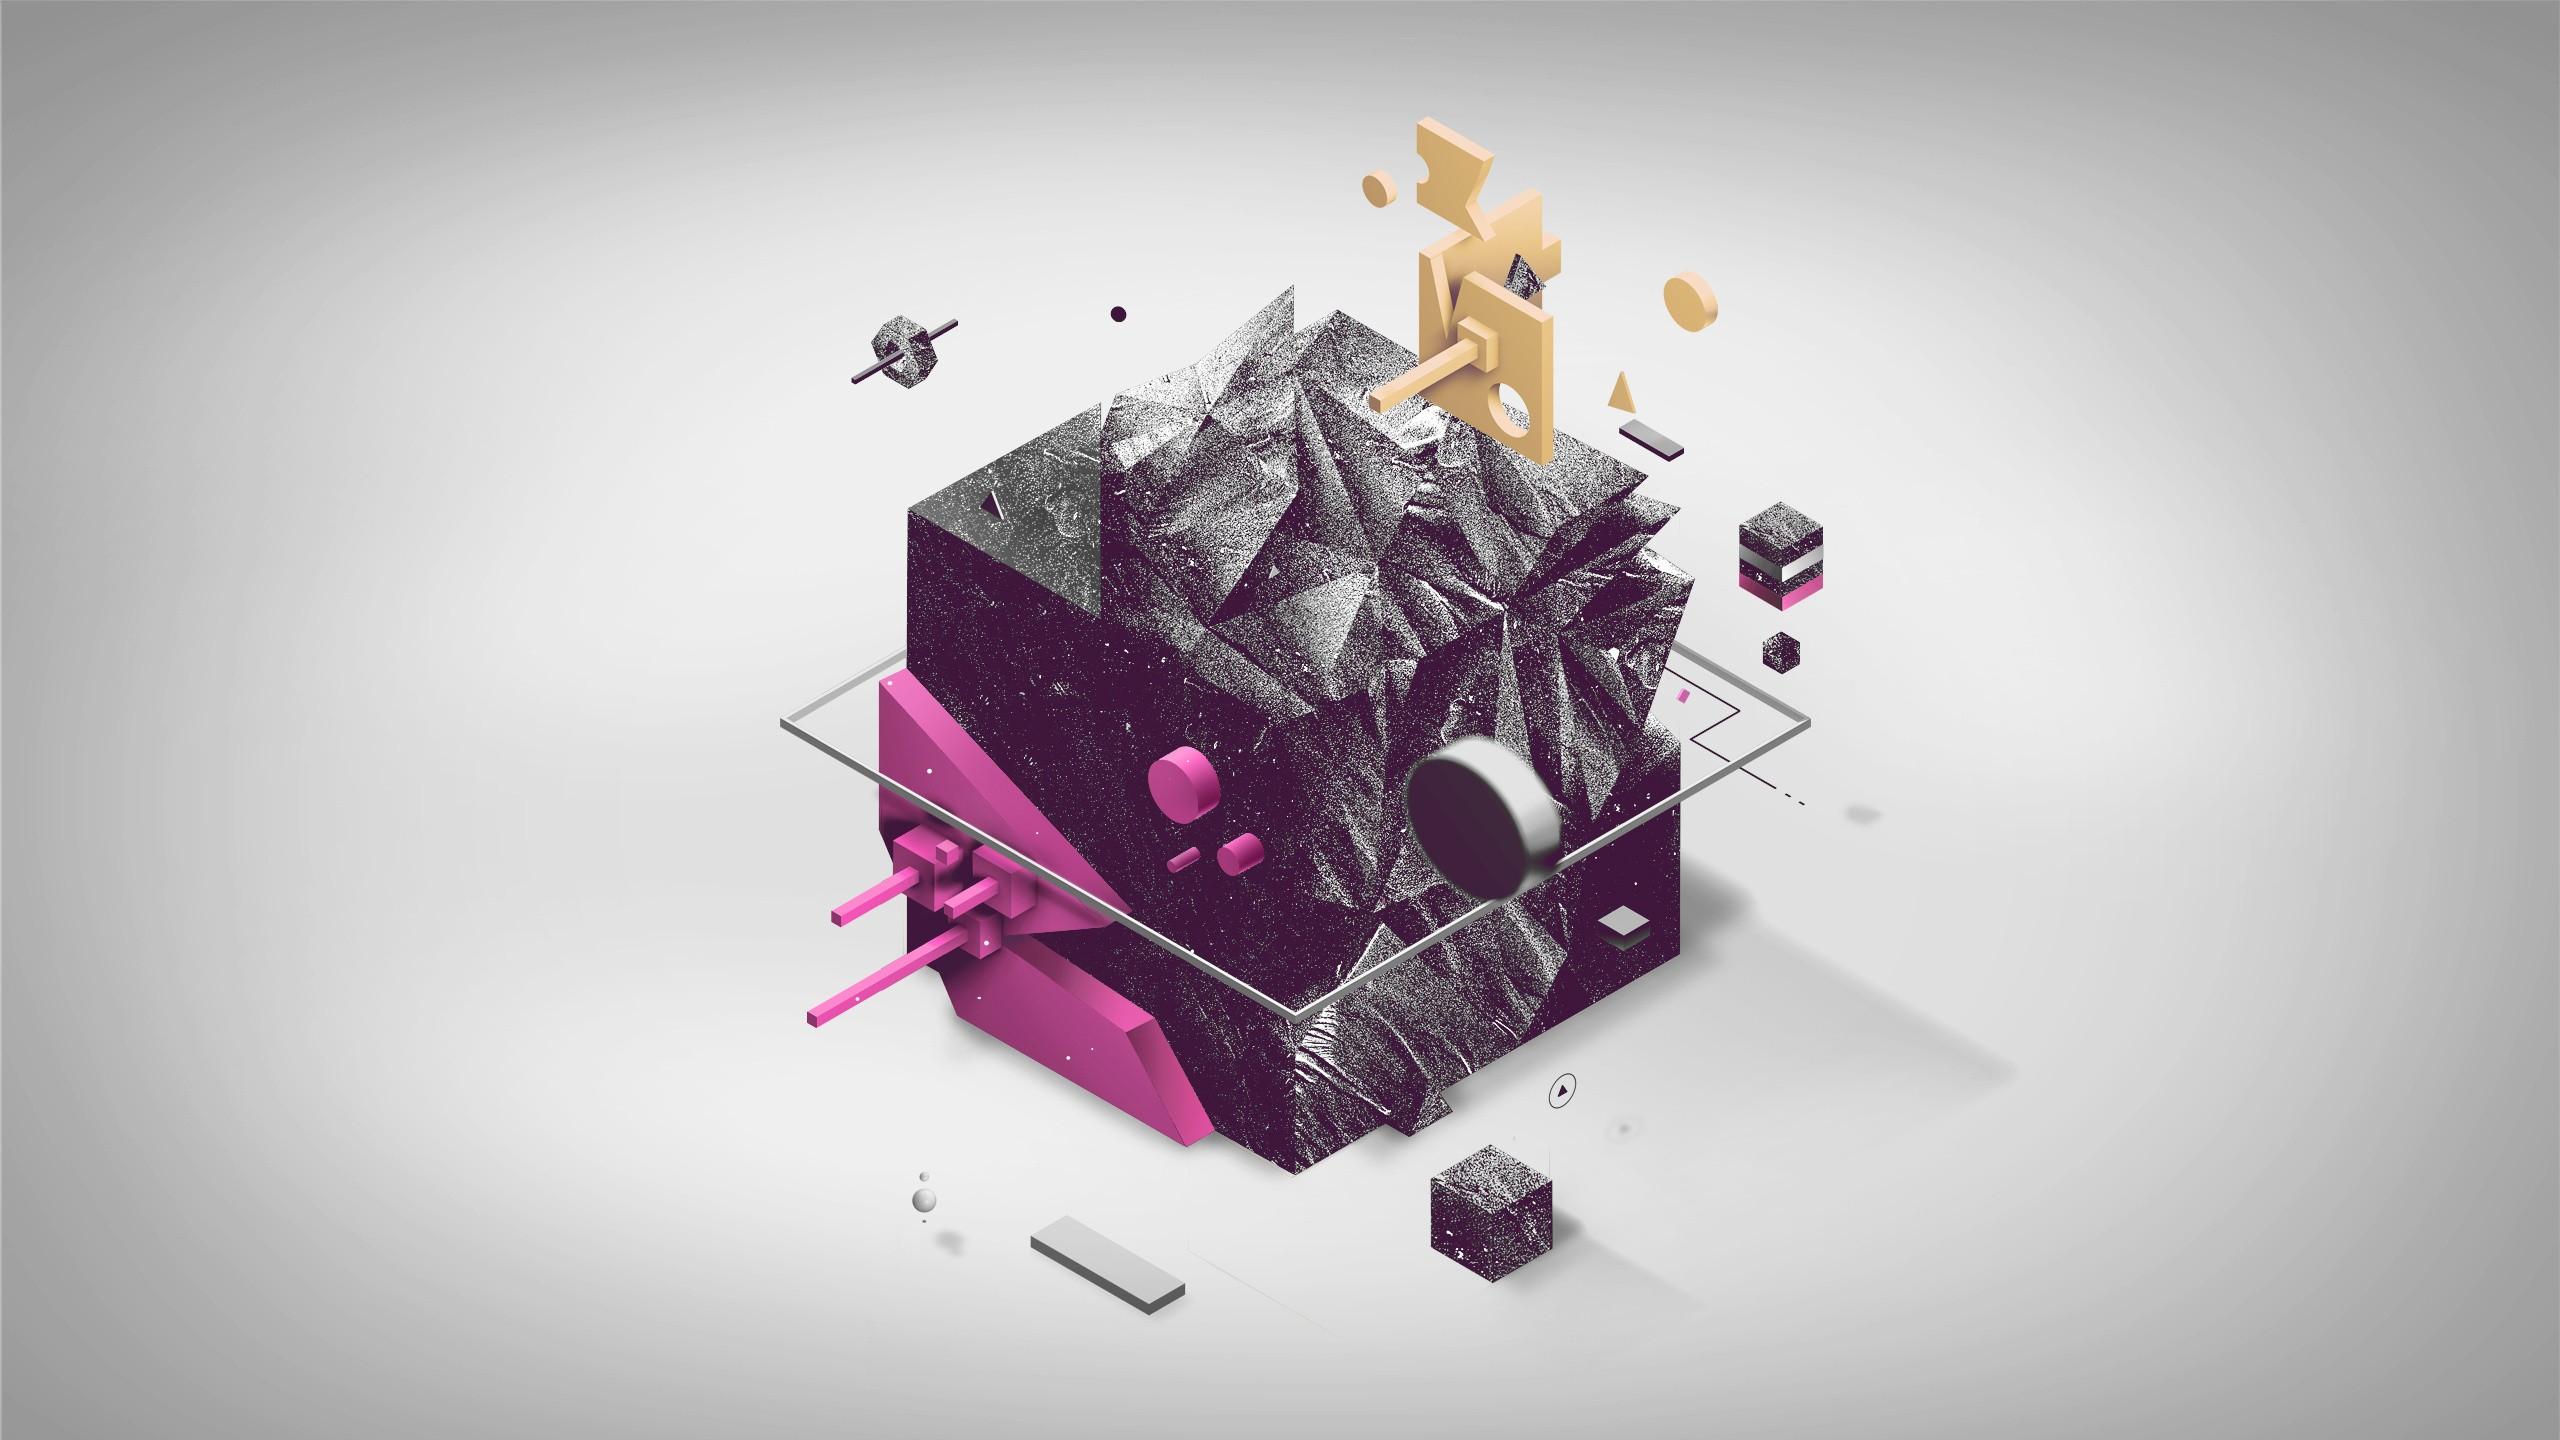 Minimalist Abstract Graphic Art